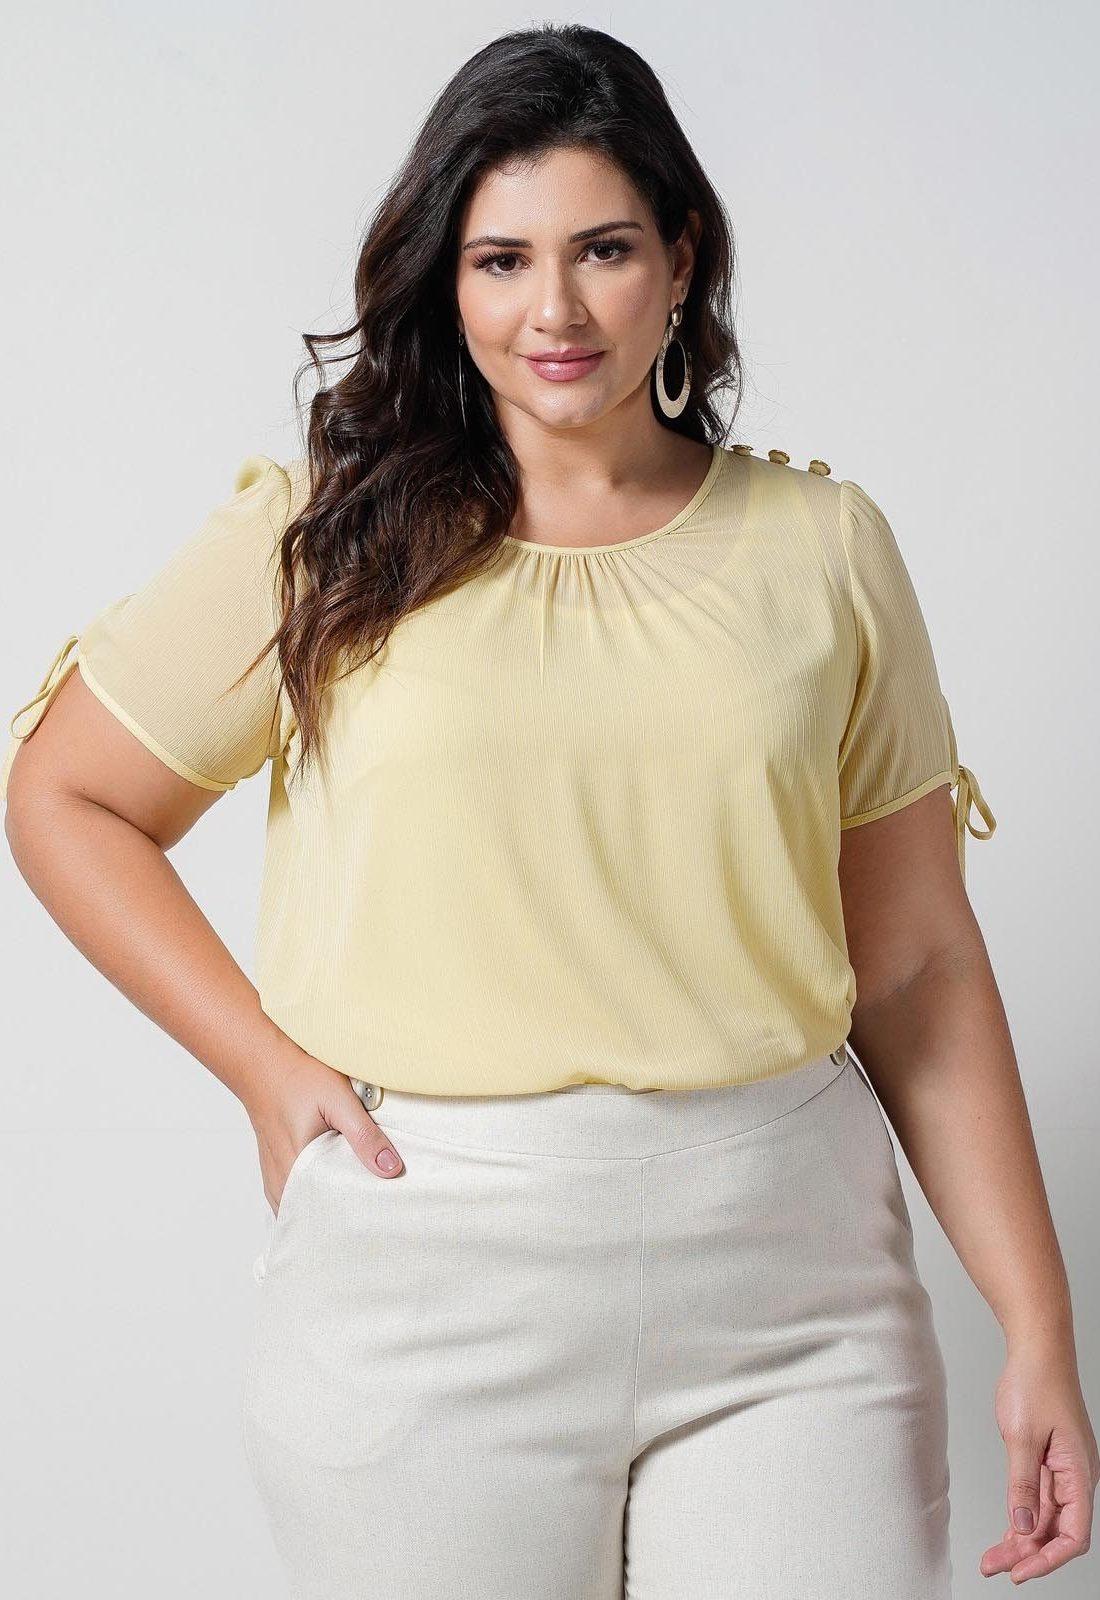 Blusa amarela com regata malha  plus size  Ref. U66421